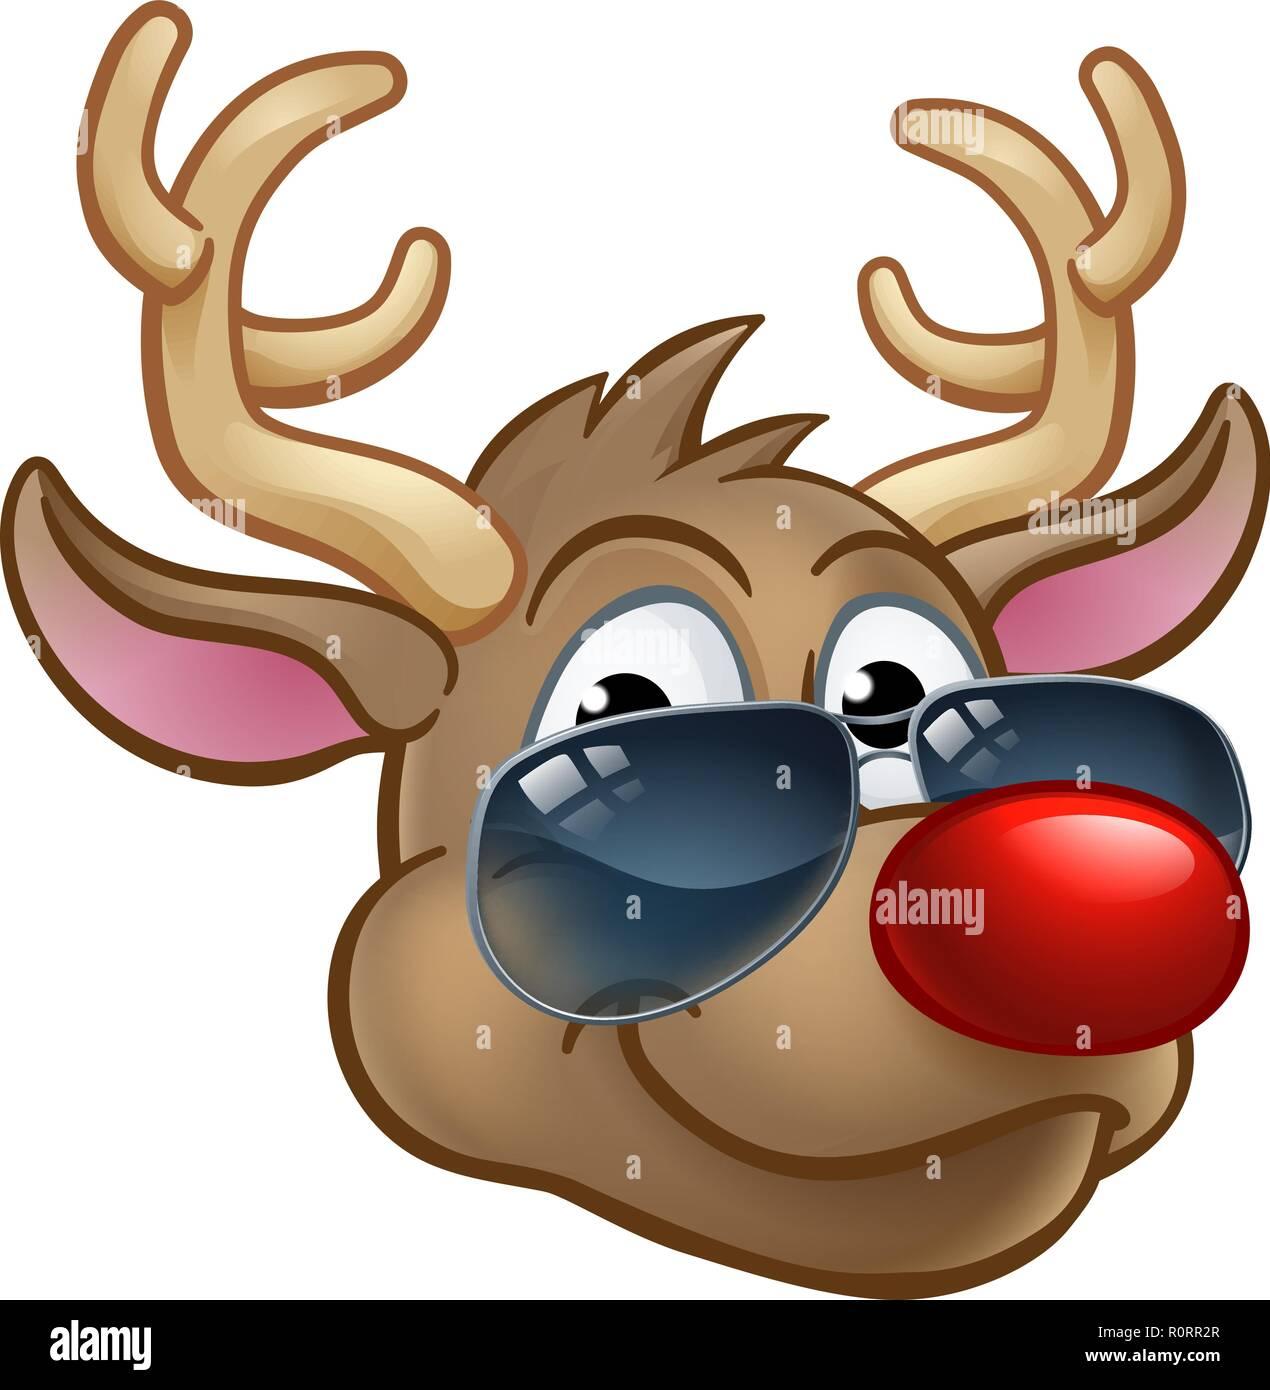 Cool Reindeer Christmas Cartoon Character Shades - Stock Image